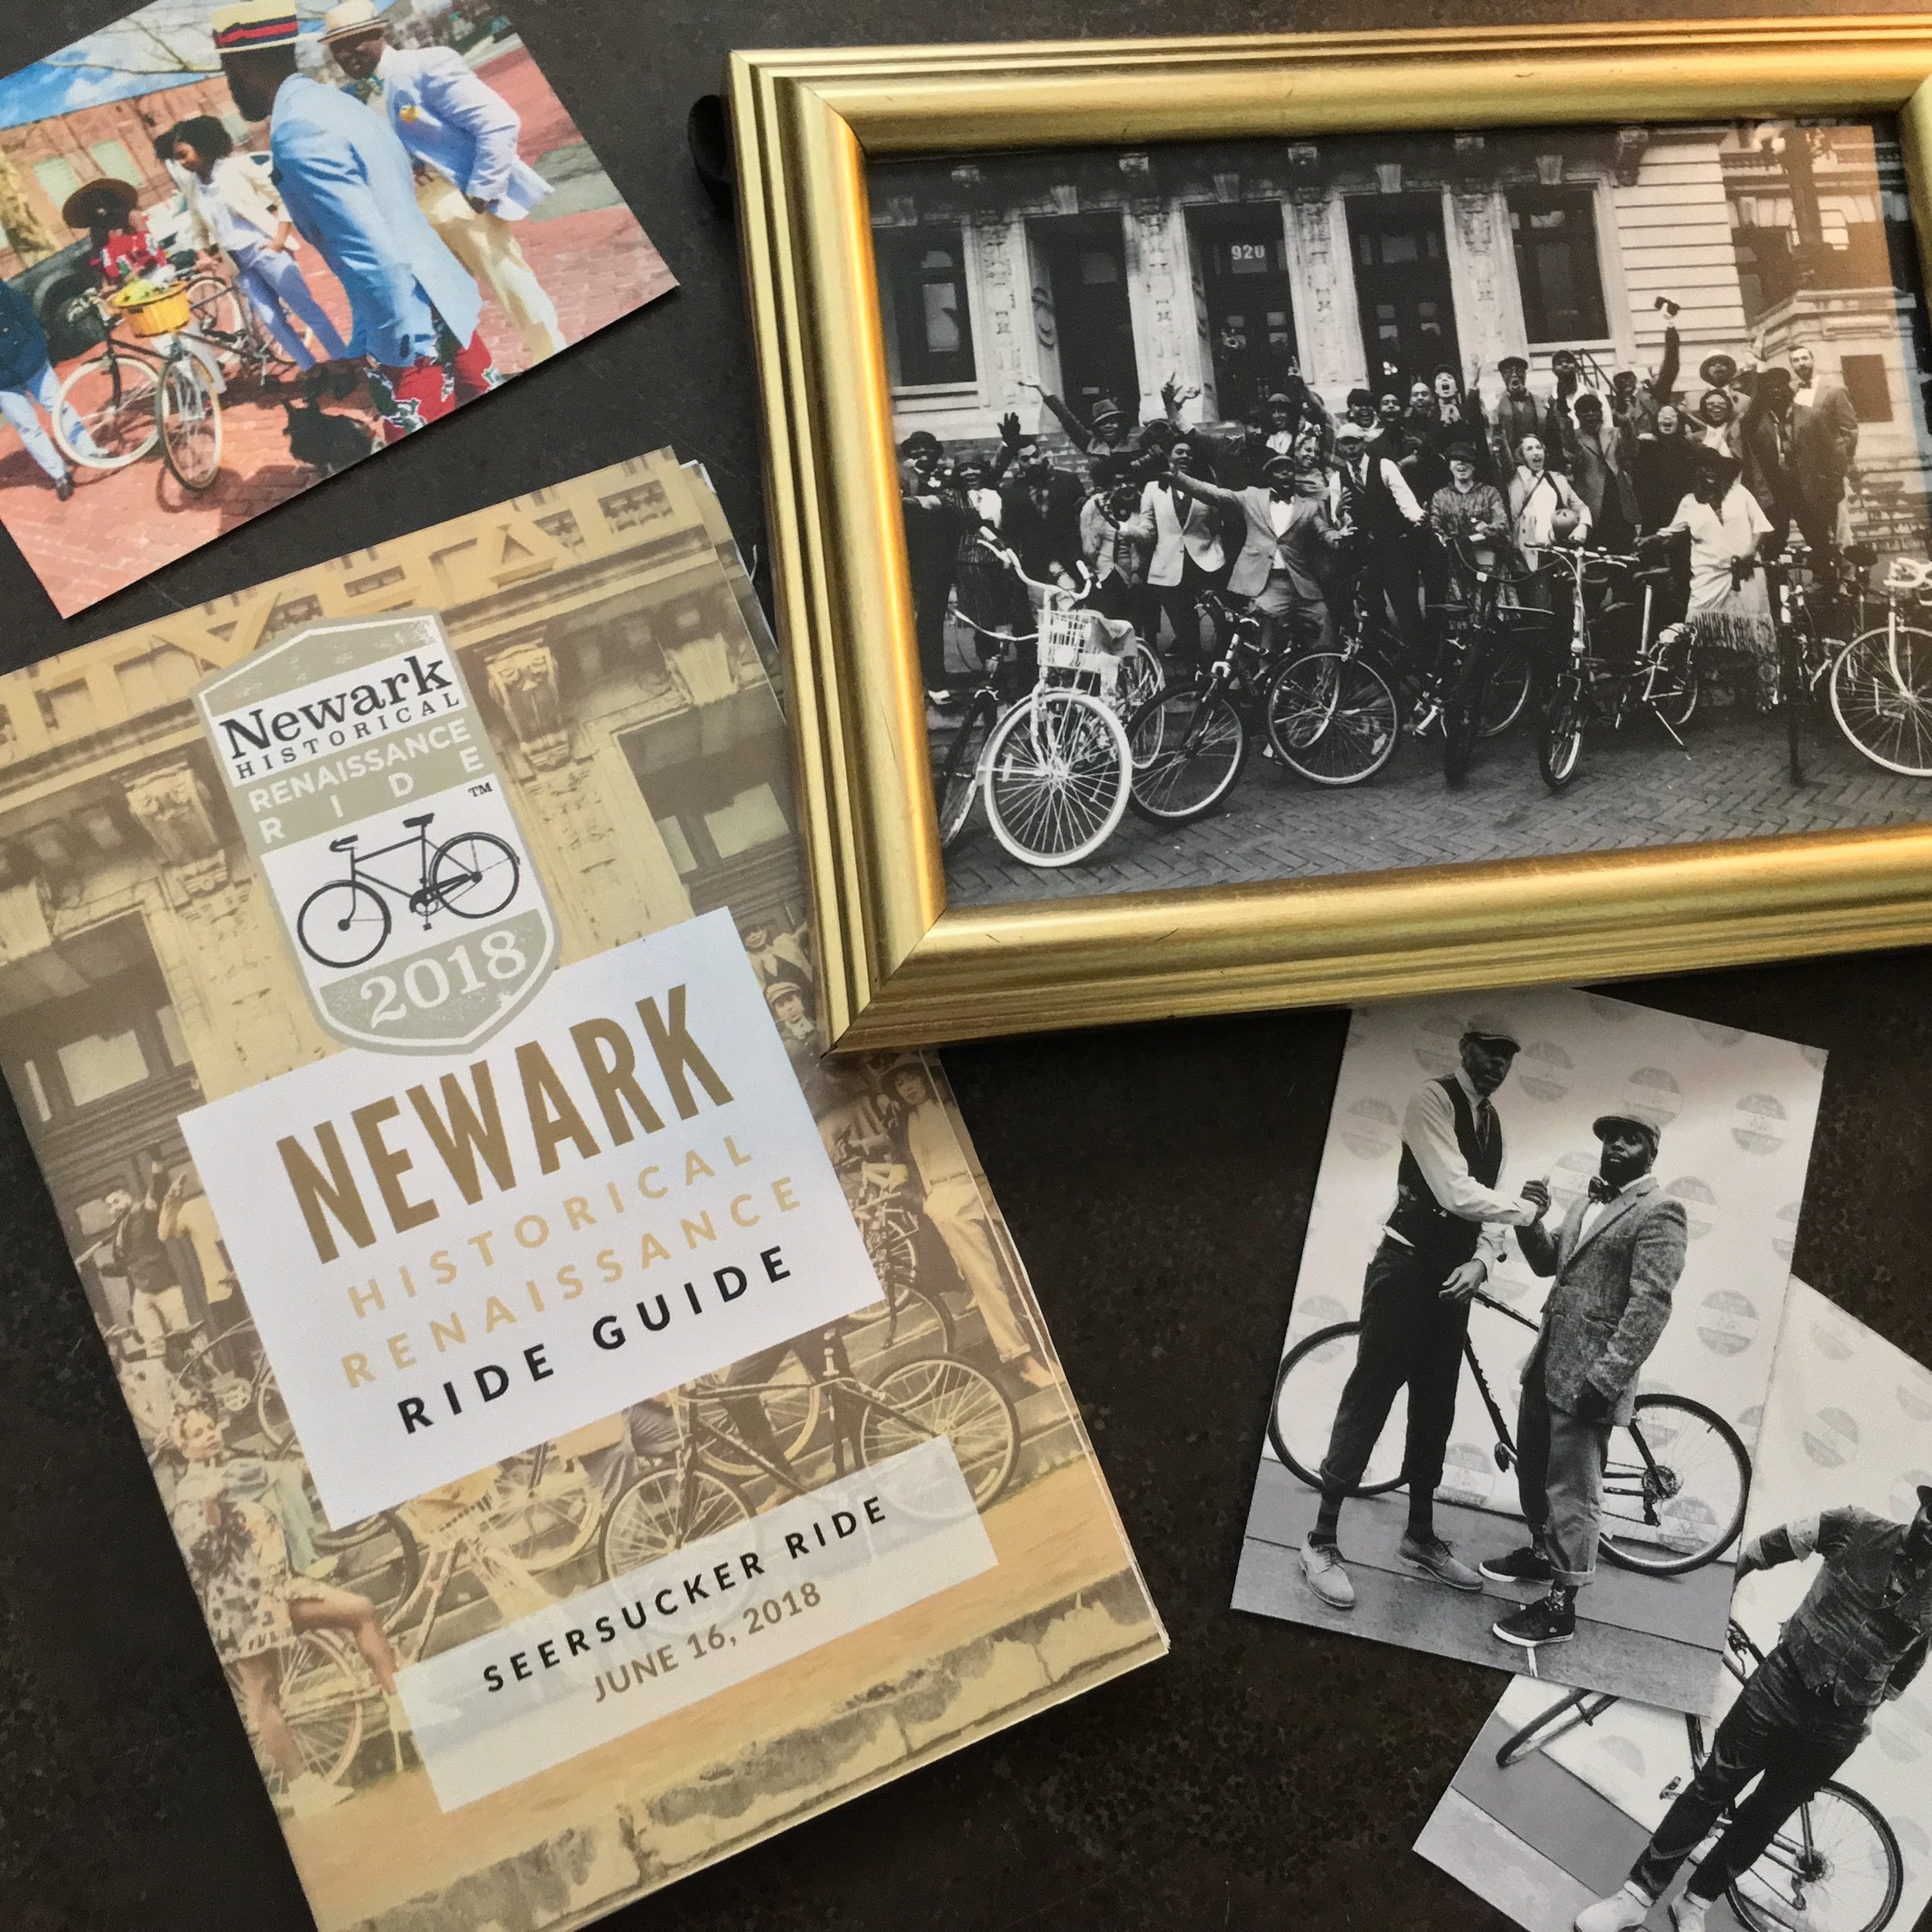 Newark Historical Renaissance Ride 2018 Seersucker Summer Social Ride Guide